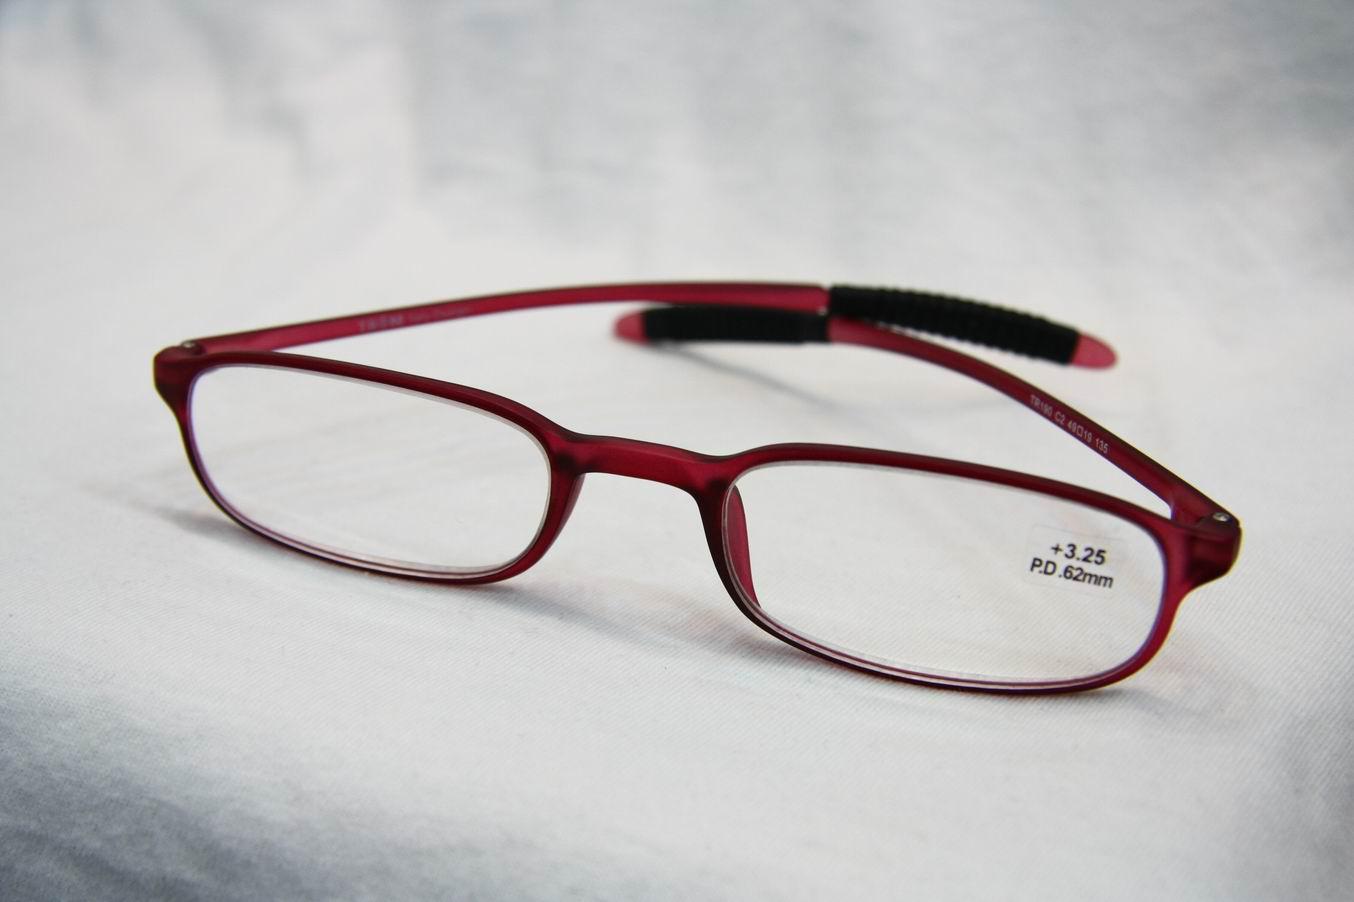 5555b8ee7052 Swissflex Style TR90 Flexible Reading Glasses, Retro Style Reading Glasses,  Fashion Plastic Reading Glasses Best Reading Glasses Review Big Reading  Glasses ...